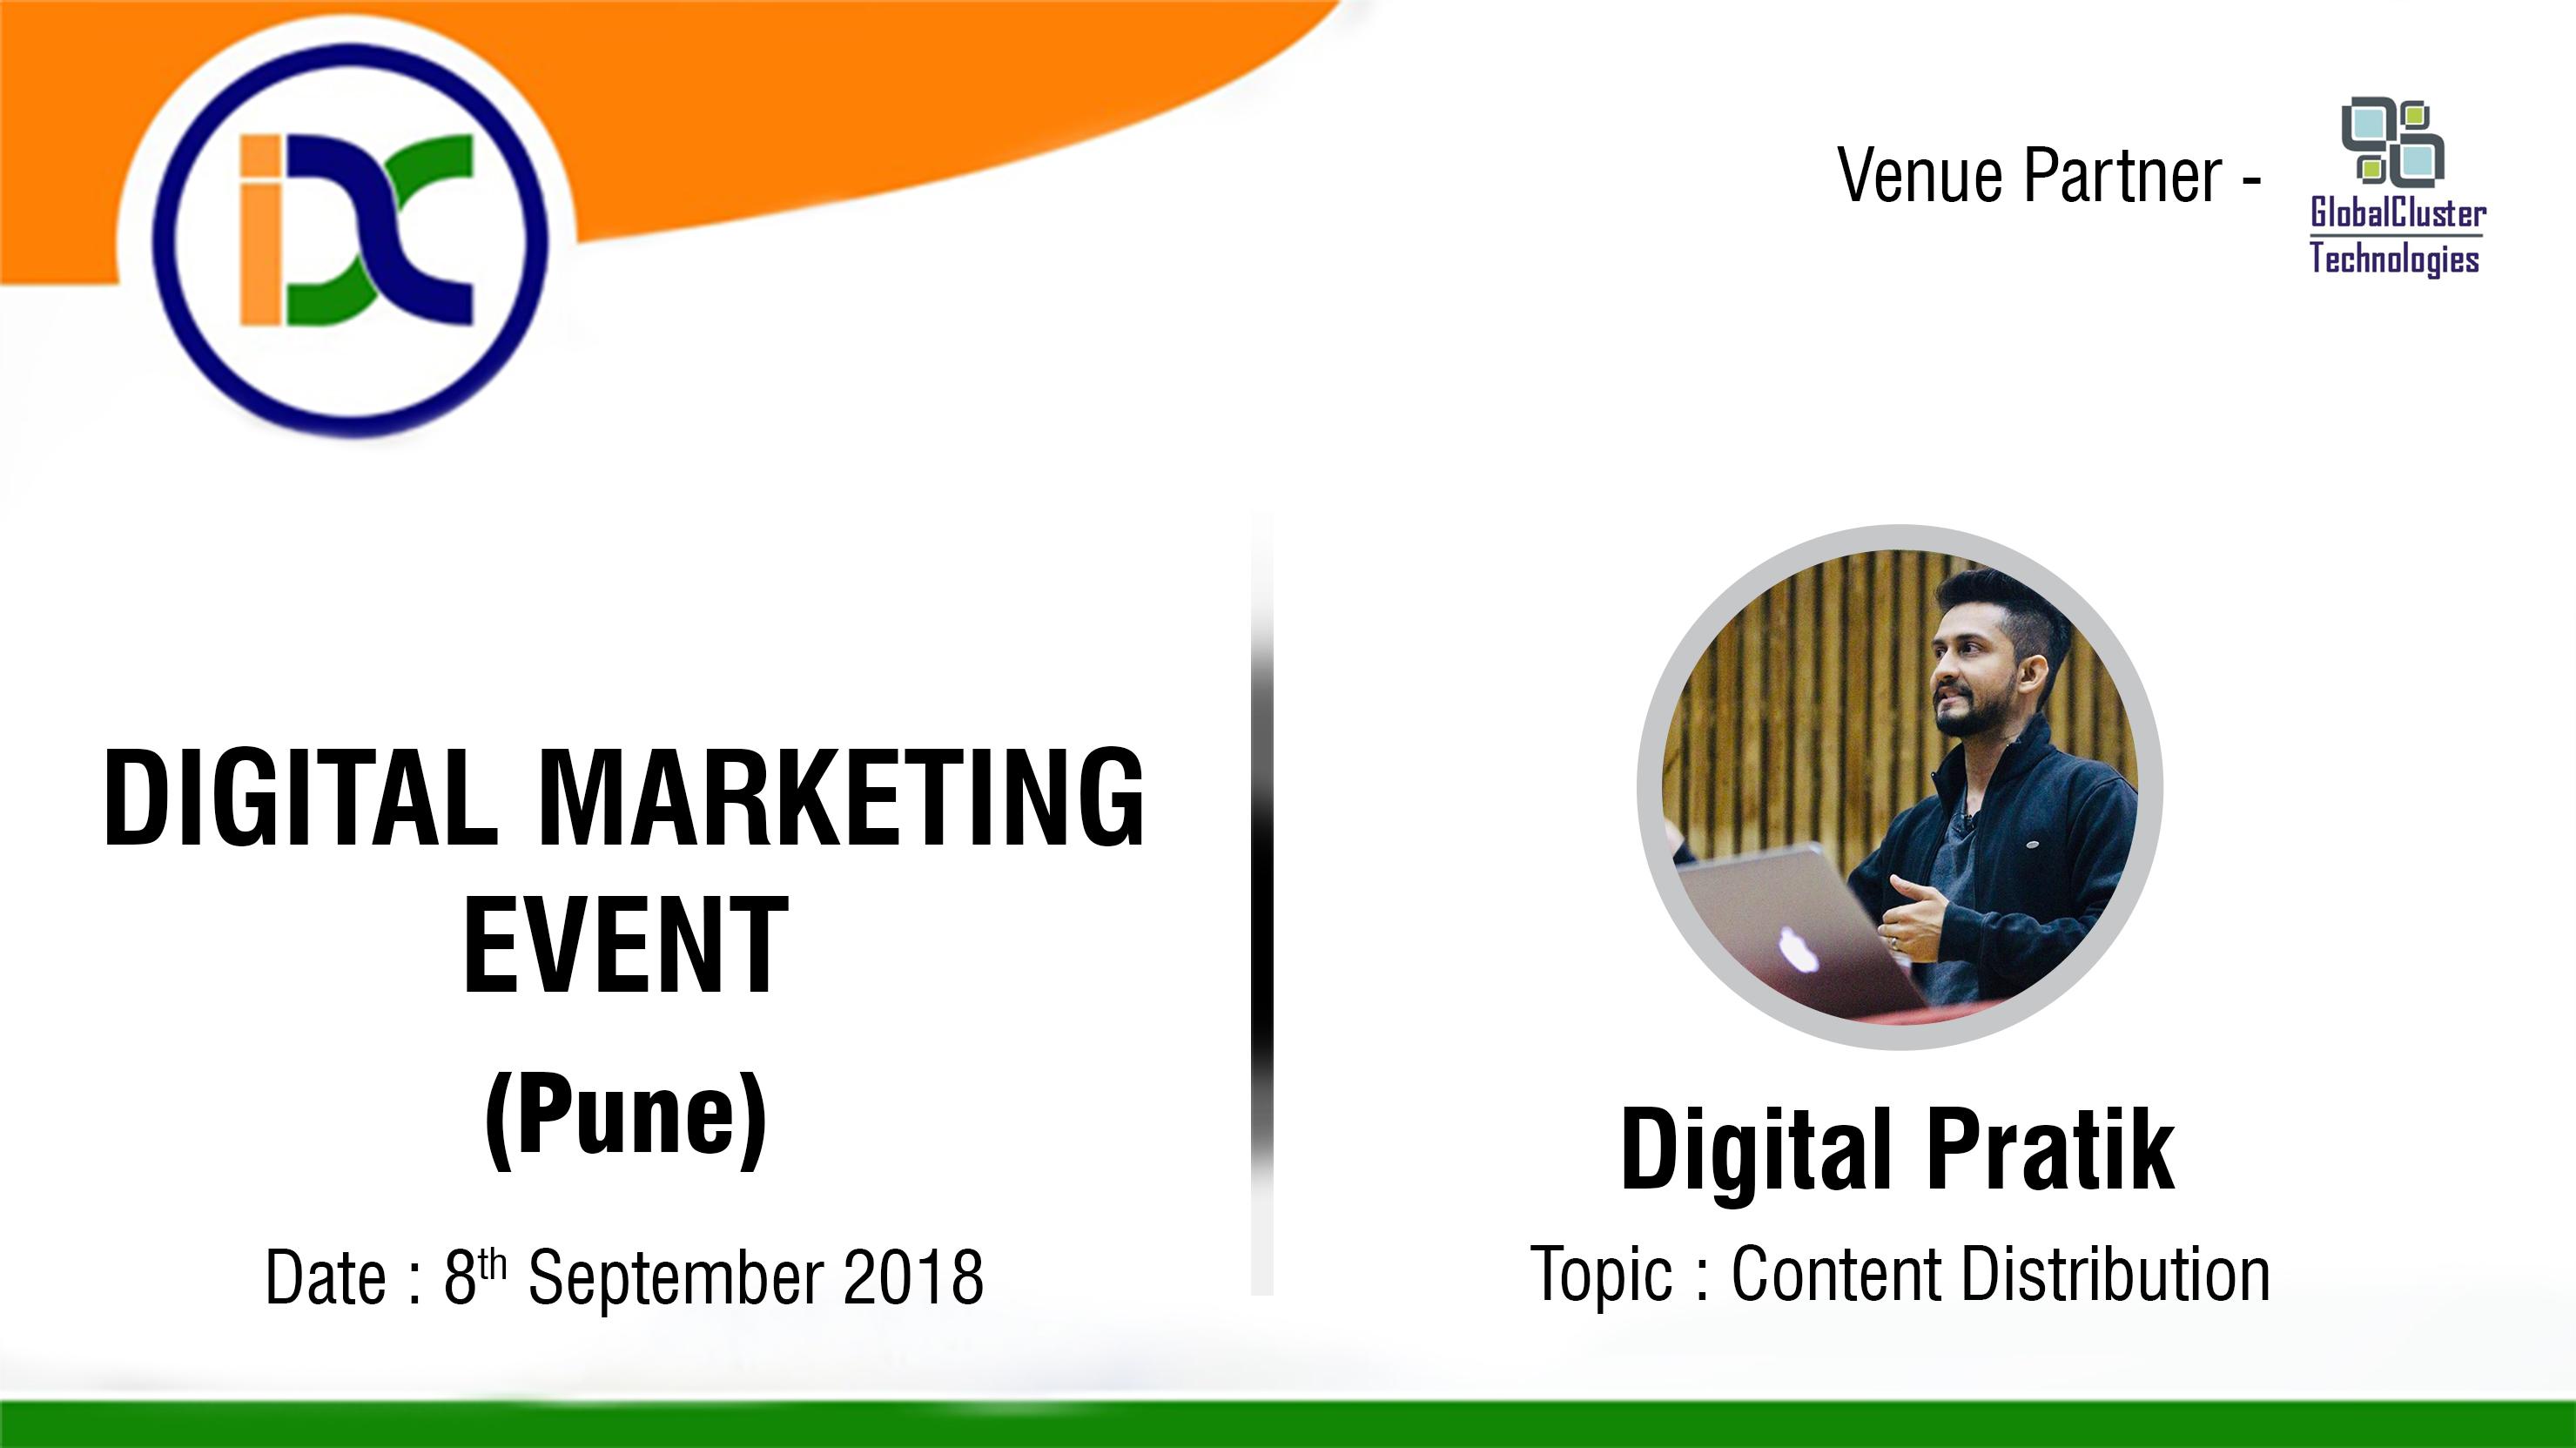 Digital Marketing Event with Digital Pratik